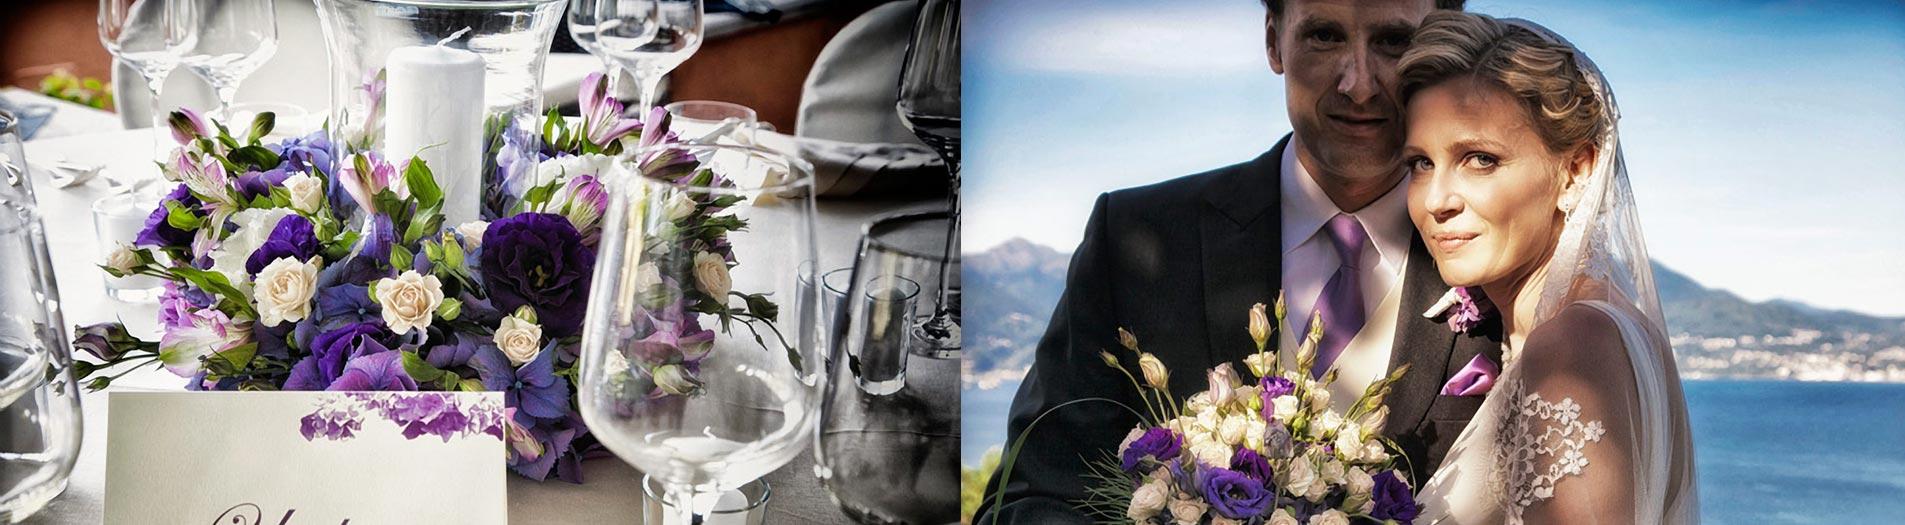 bouquet-sposa-fiori-viola